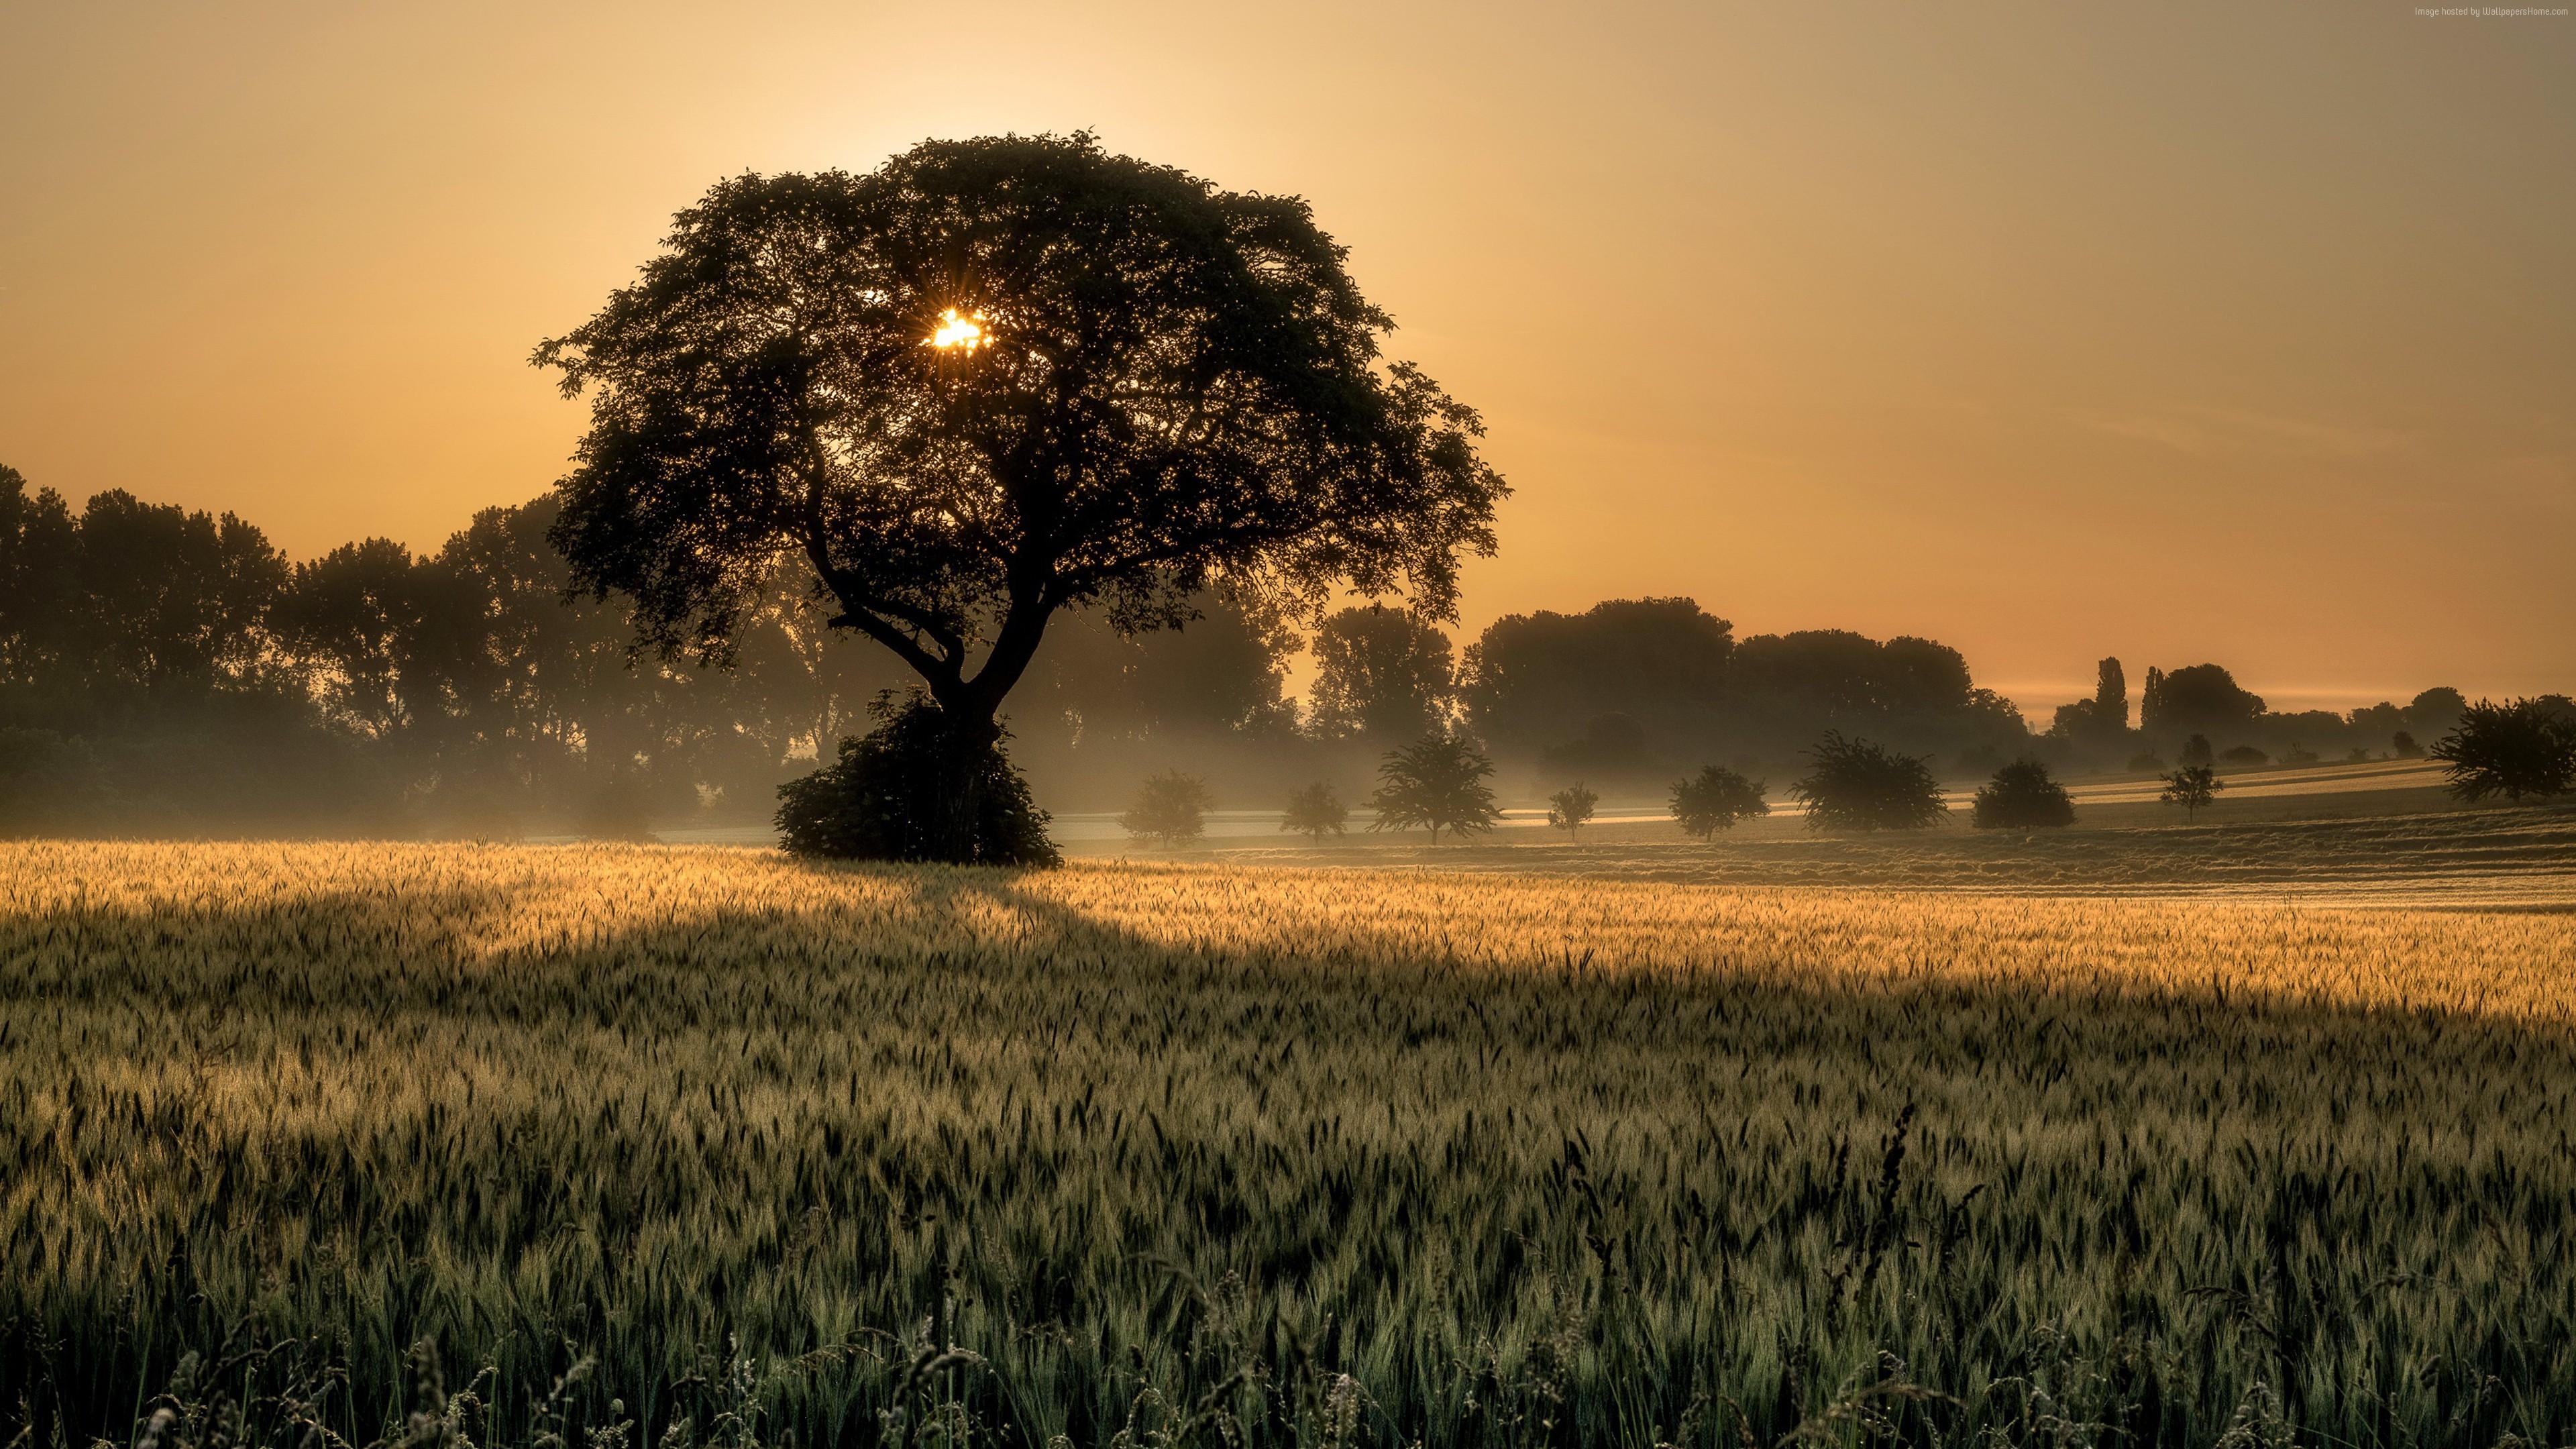 Wallpaper Sunset Tree Field 4k Nature Wallpaper Download